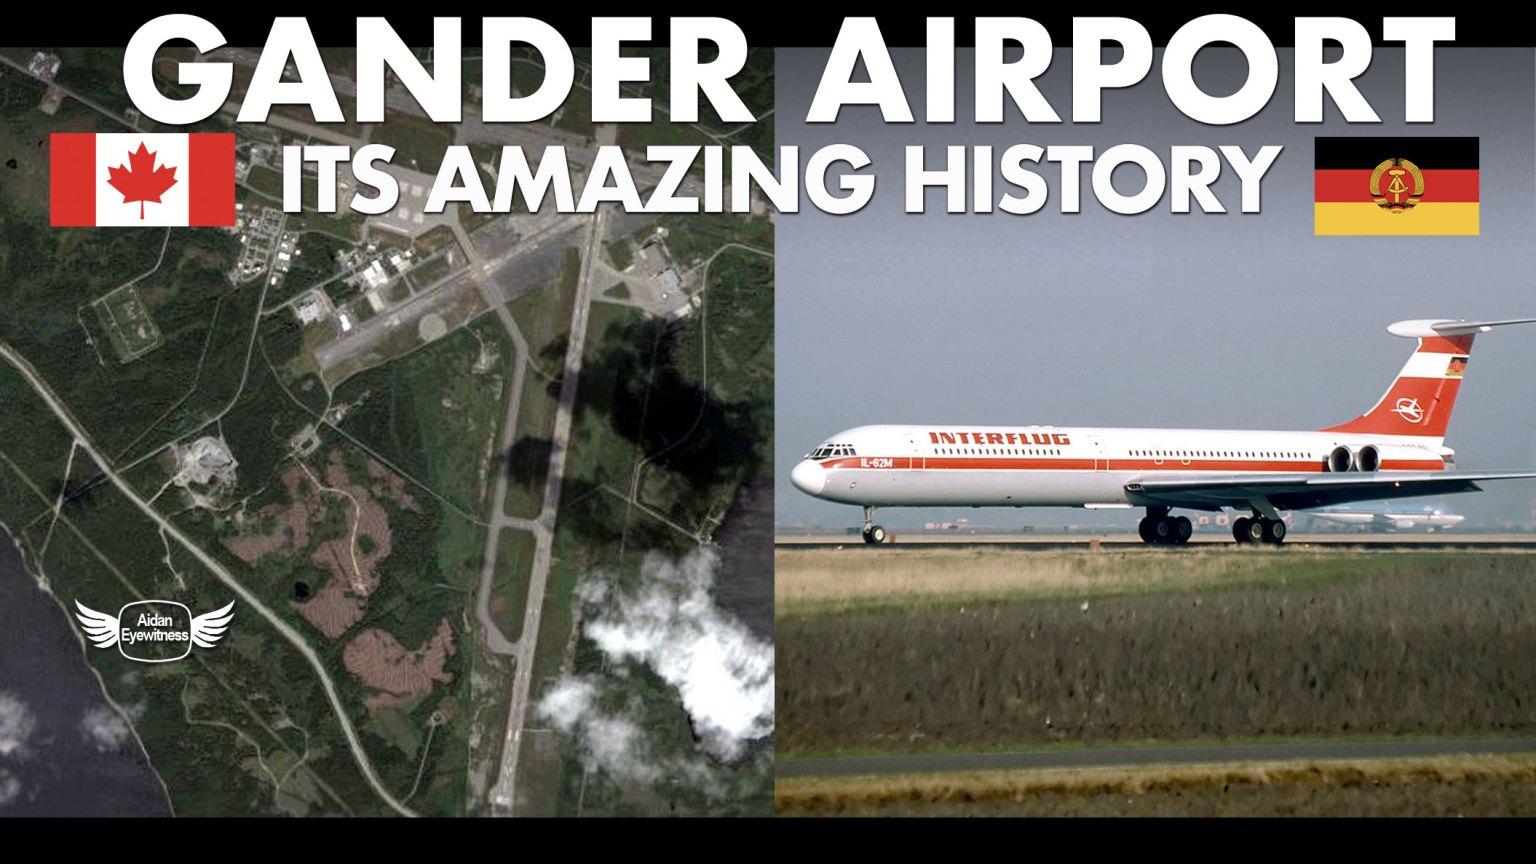 Gander Airport its amazing history